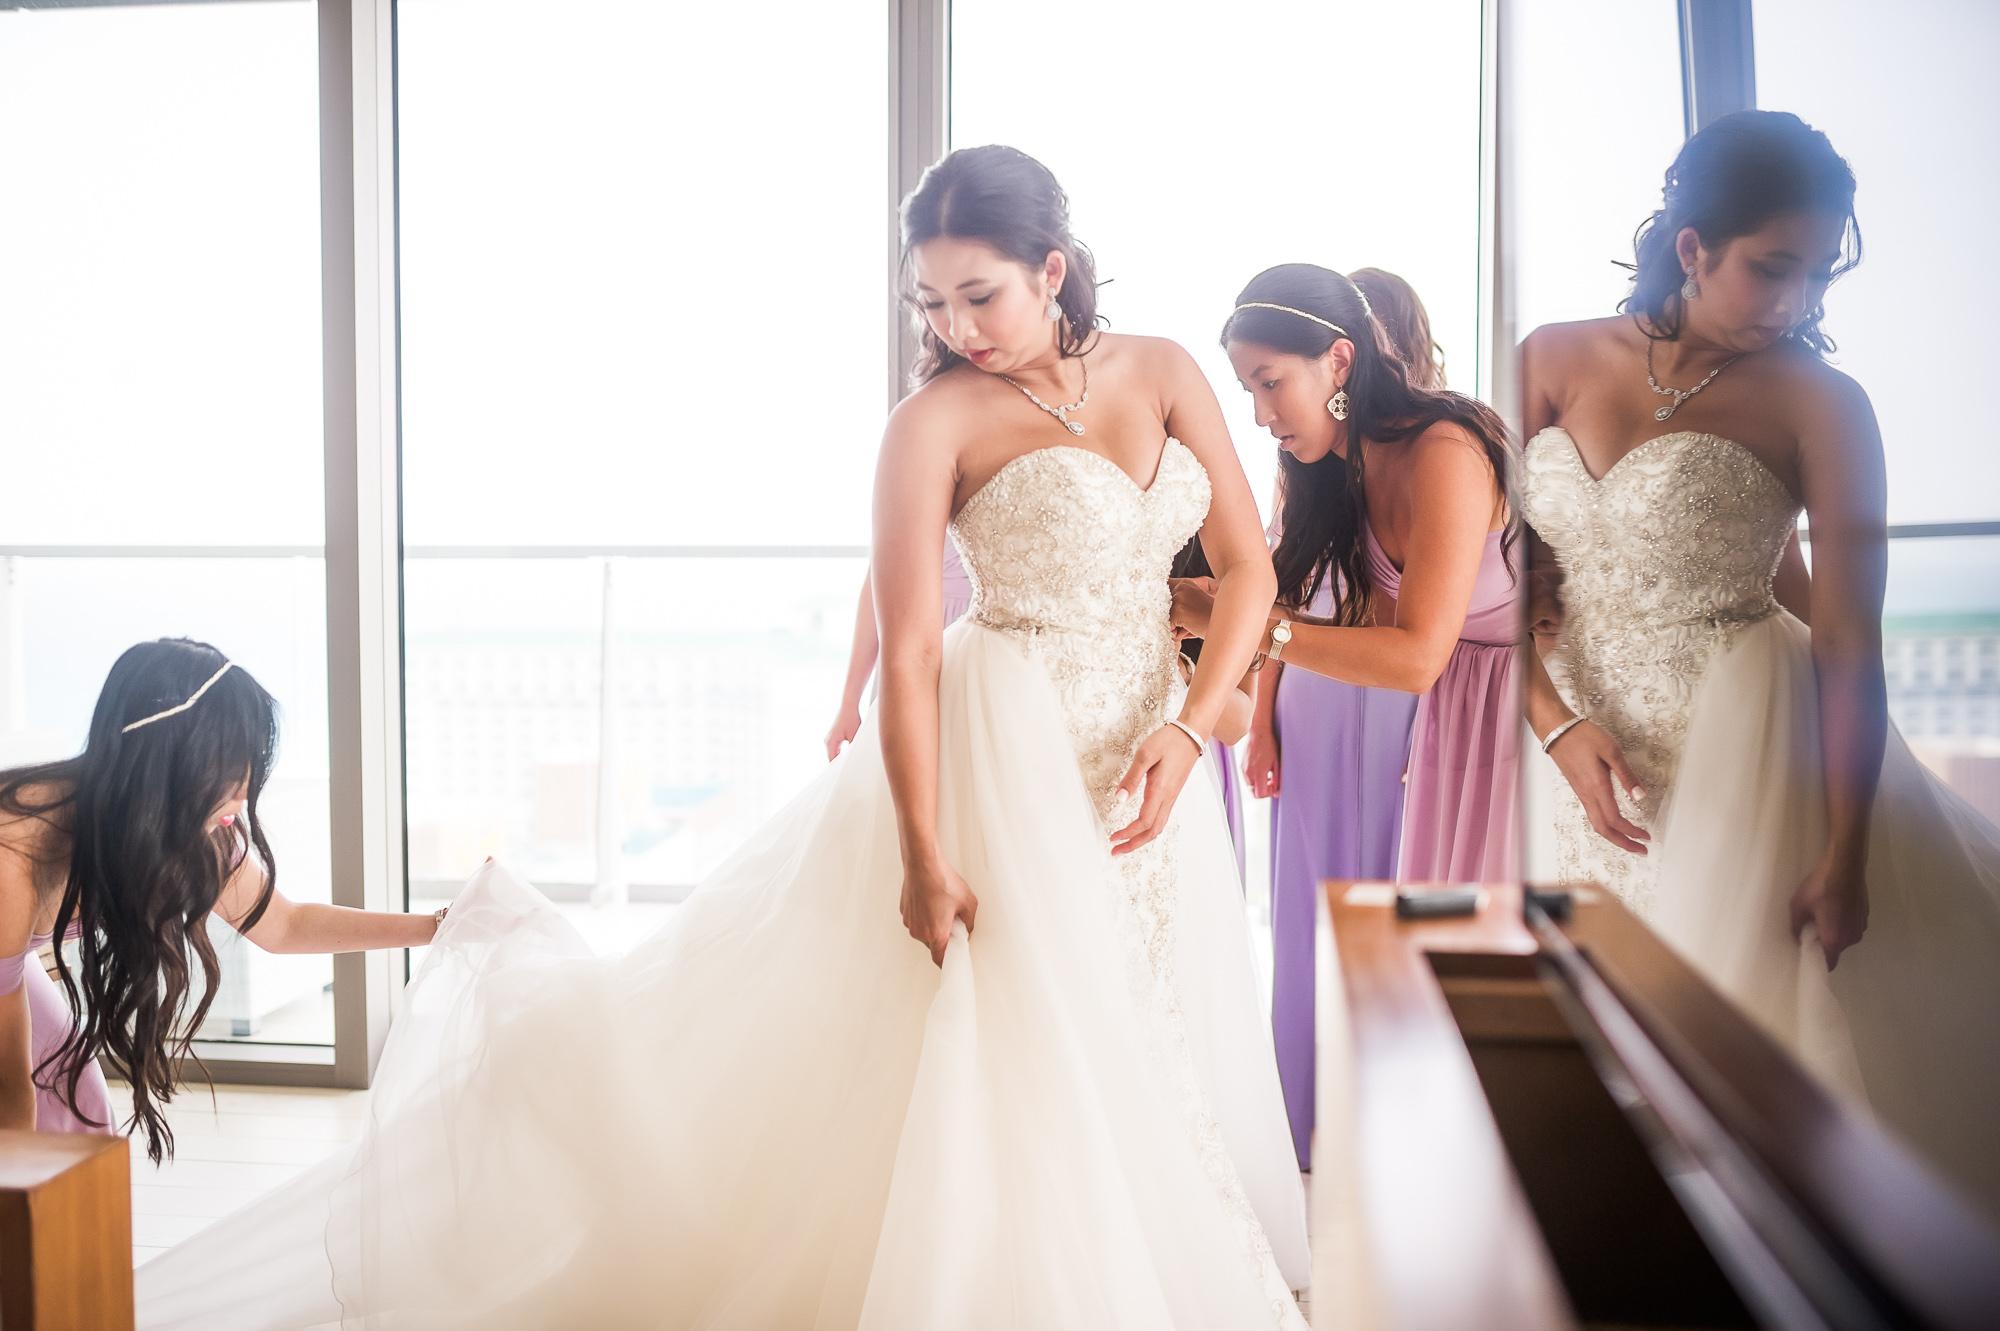 16-David Loi Studios - Cancun - Mexico - Destination Wedding-25583.jpg